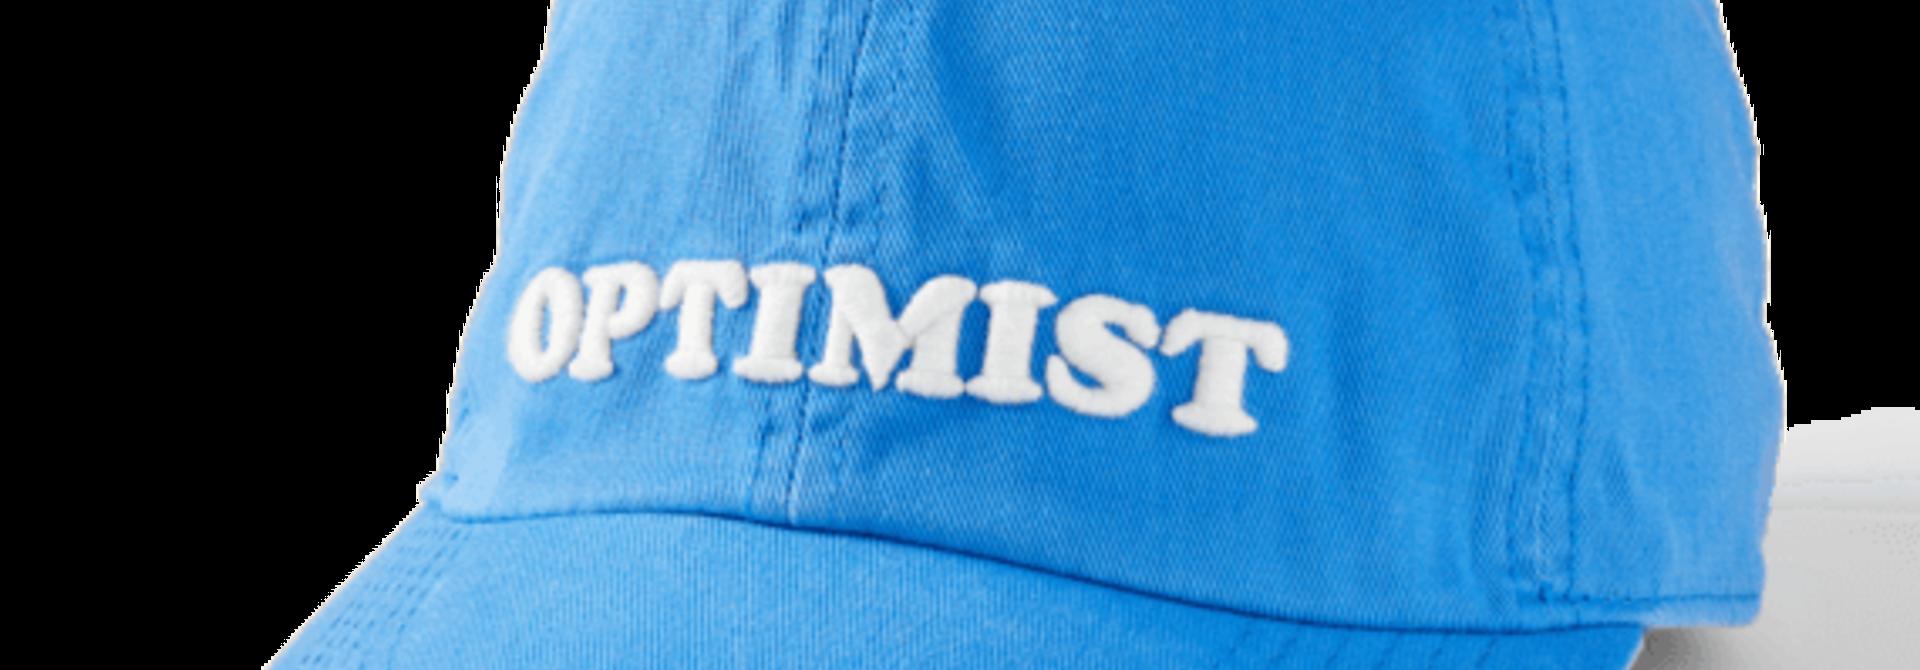 Optimist Chill Cap, Royal Blue